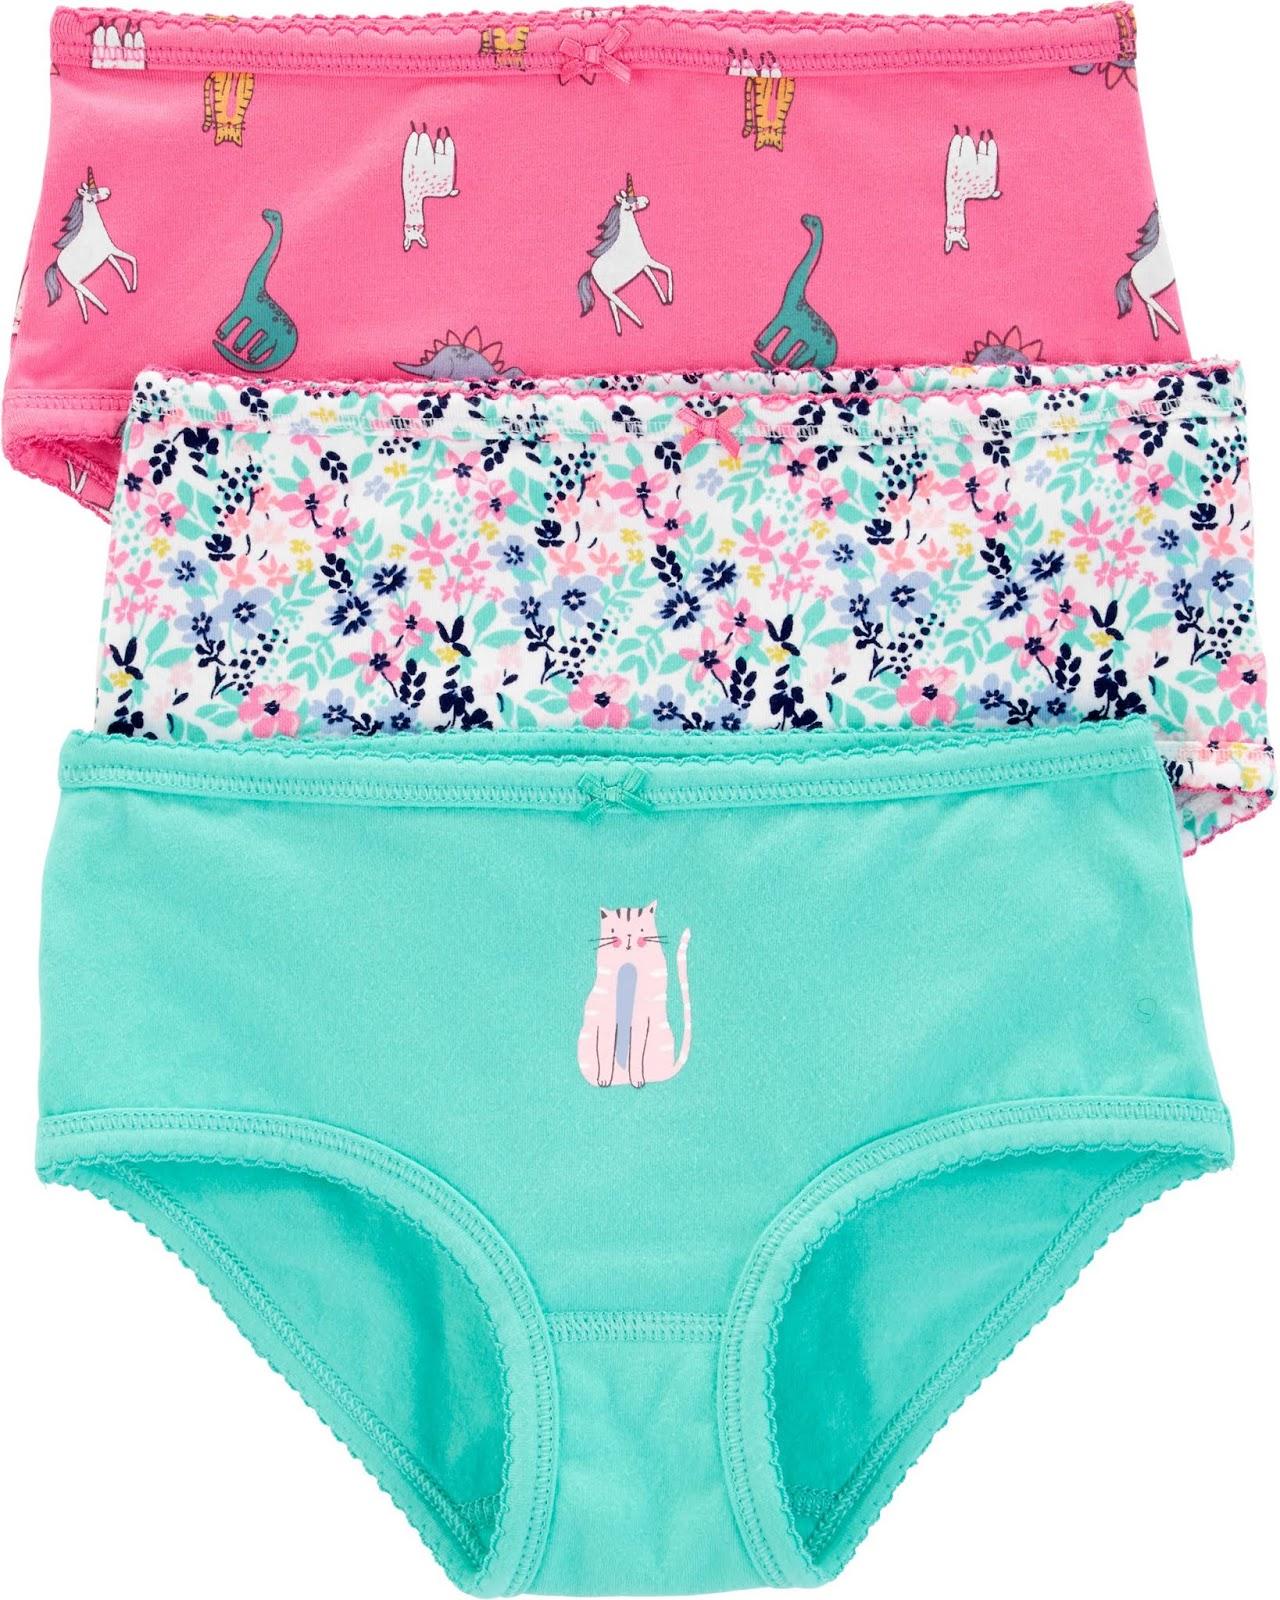 Carters 3 Pack Girl Underwear